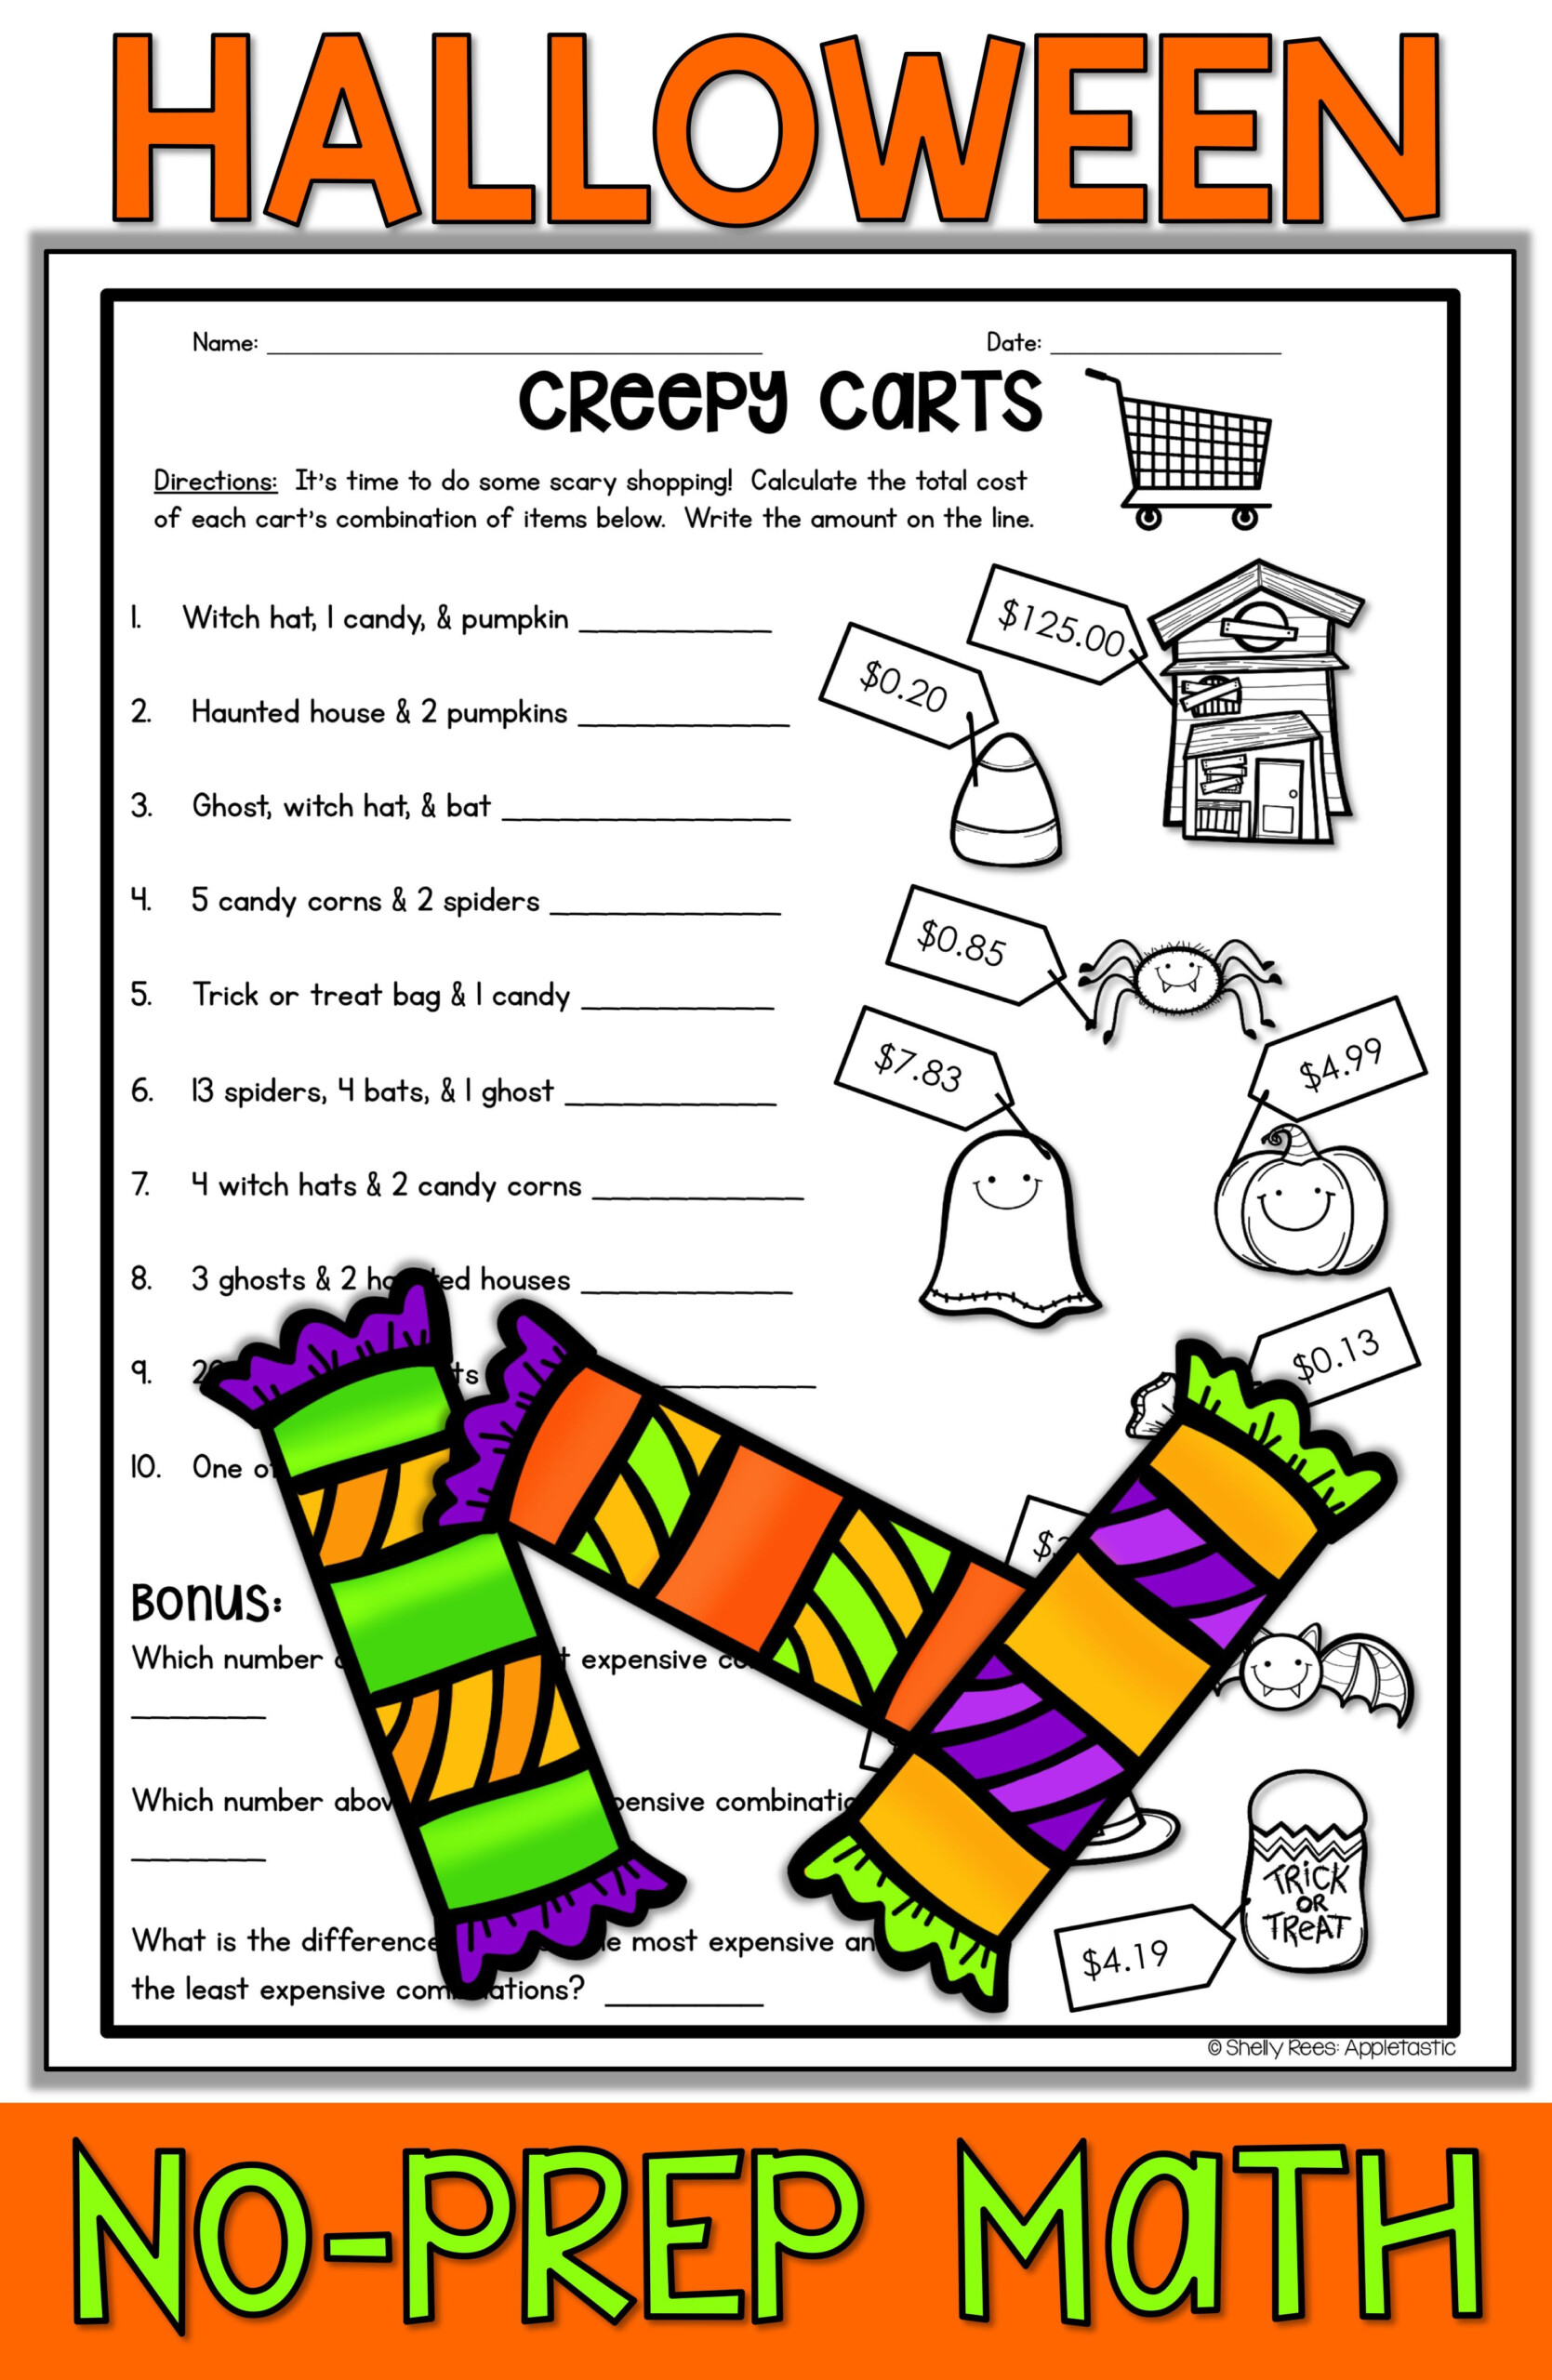 Halloween Math Worksheets | Halloween Math Worksheets pertaining to Multiplication Worksheets Halloween